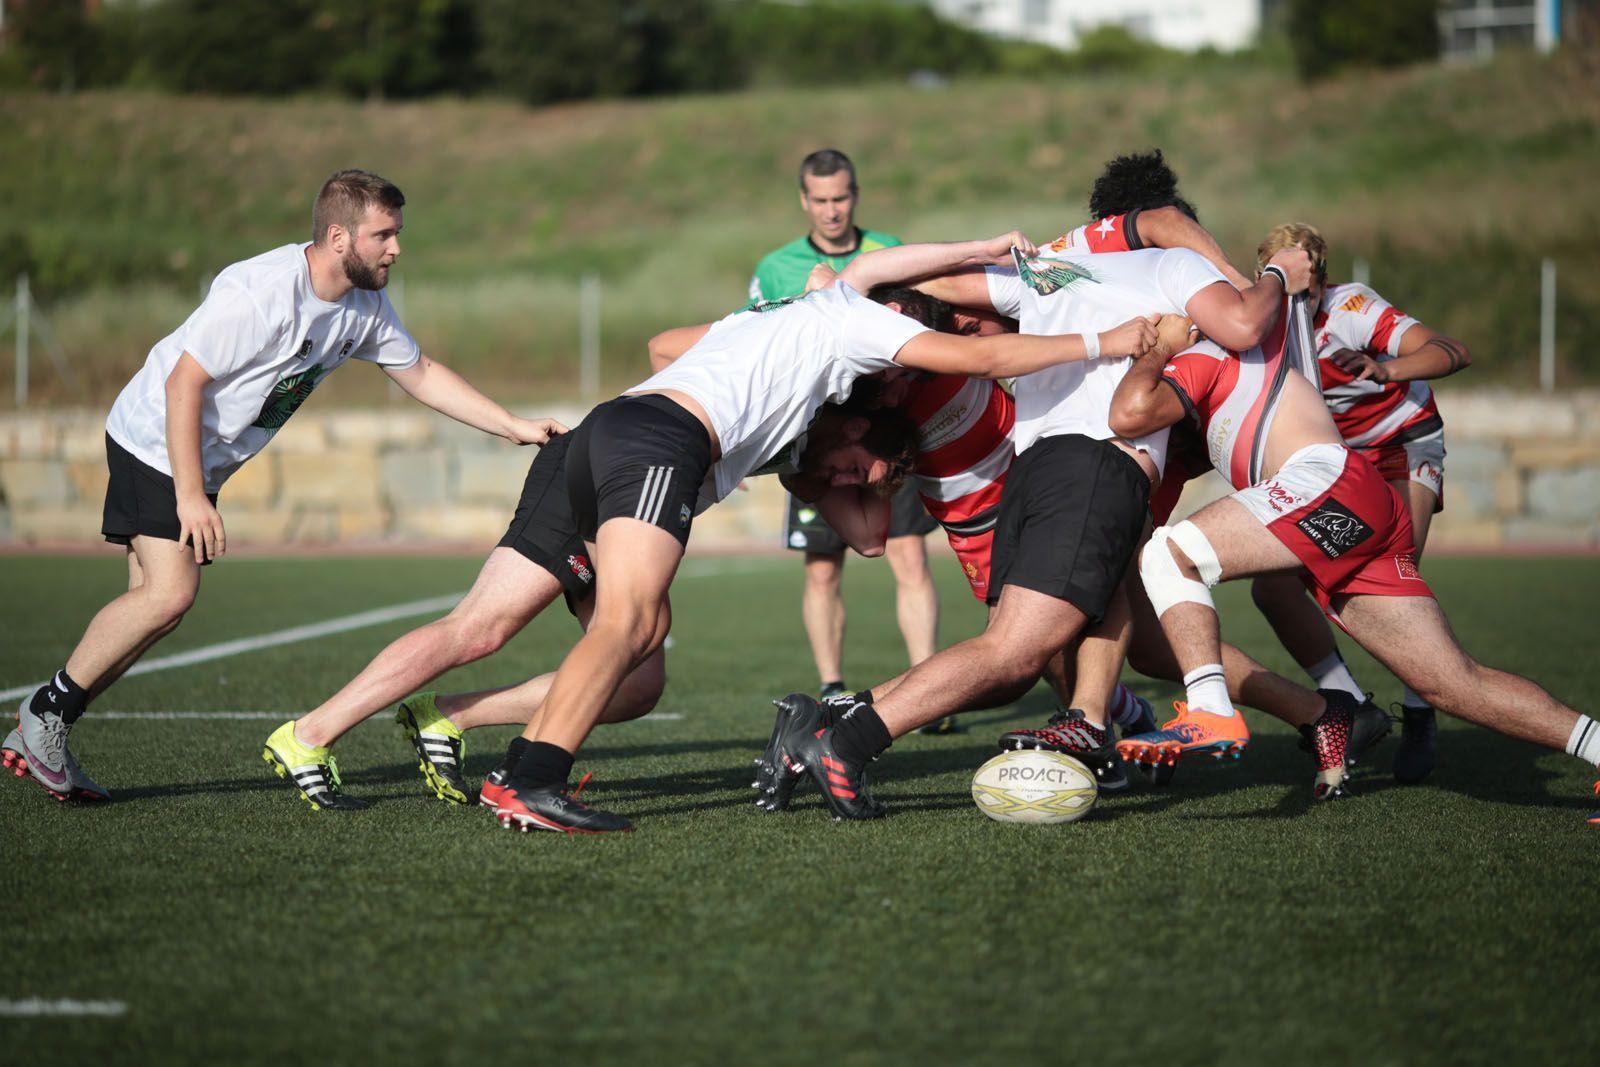 Torneig rugby seven FOTO: Artur Ribera